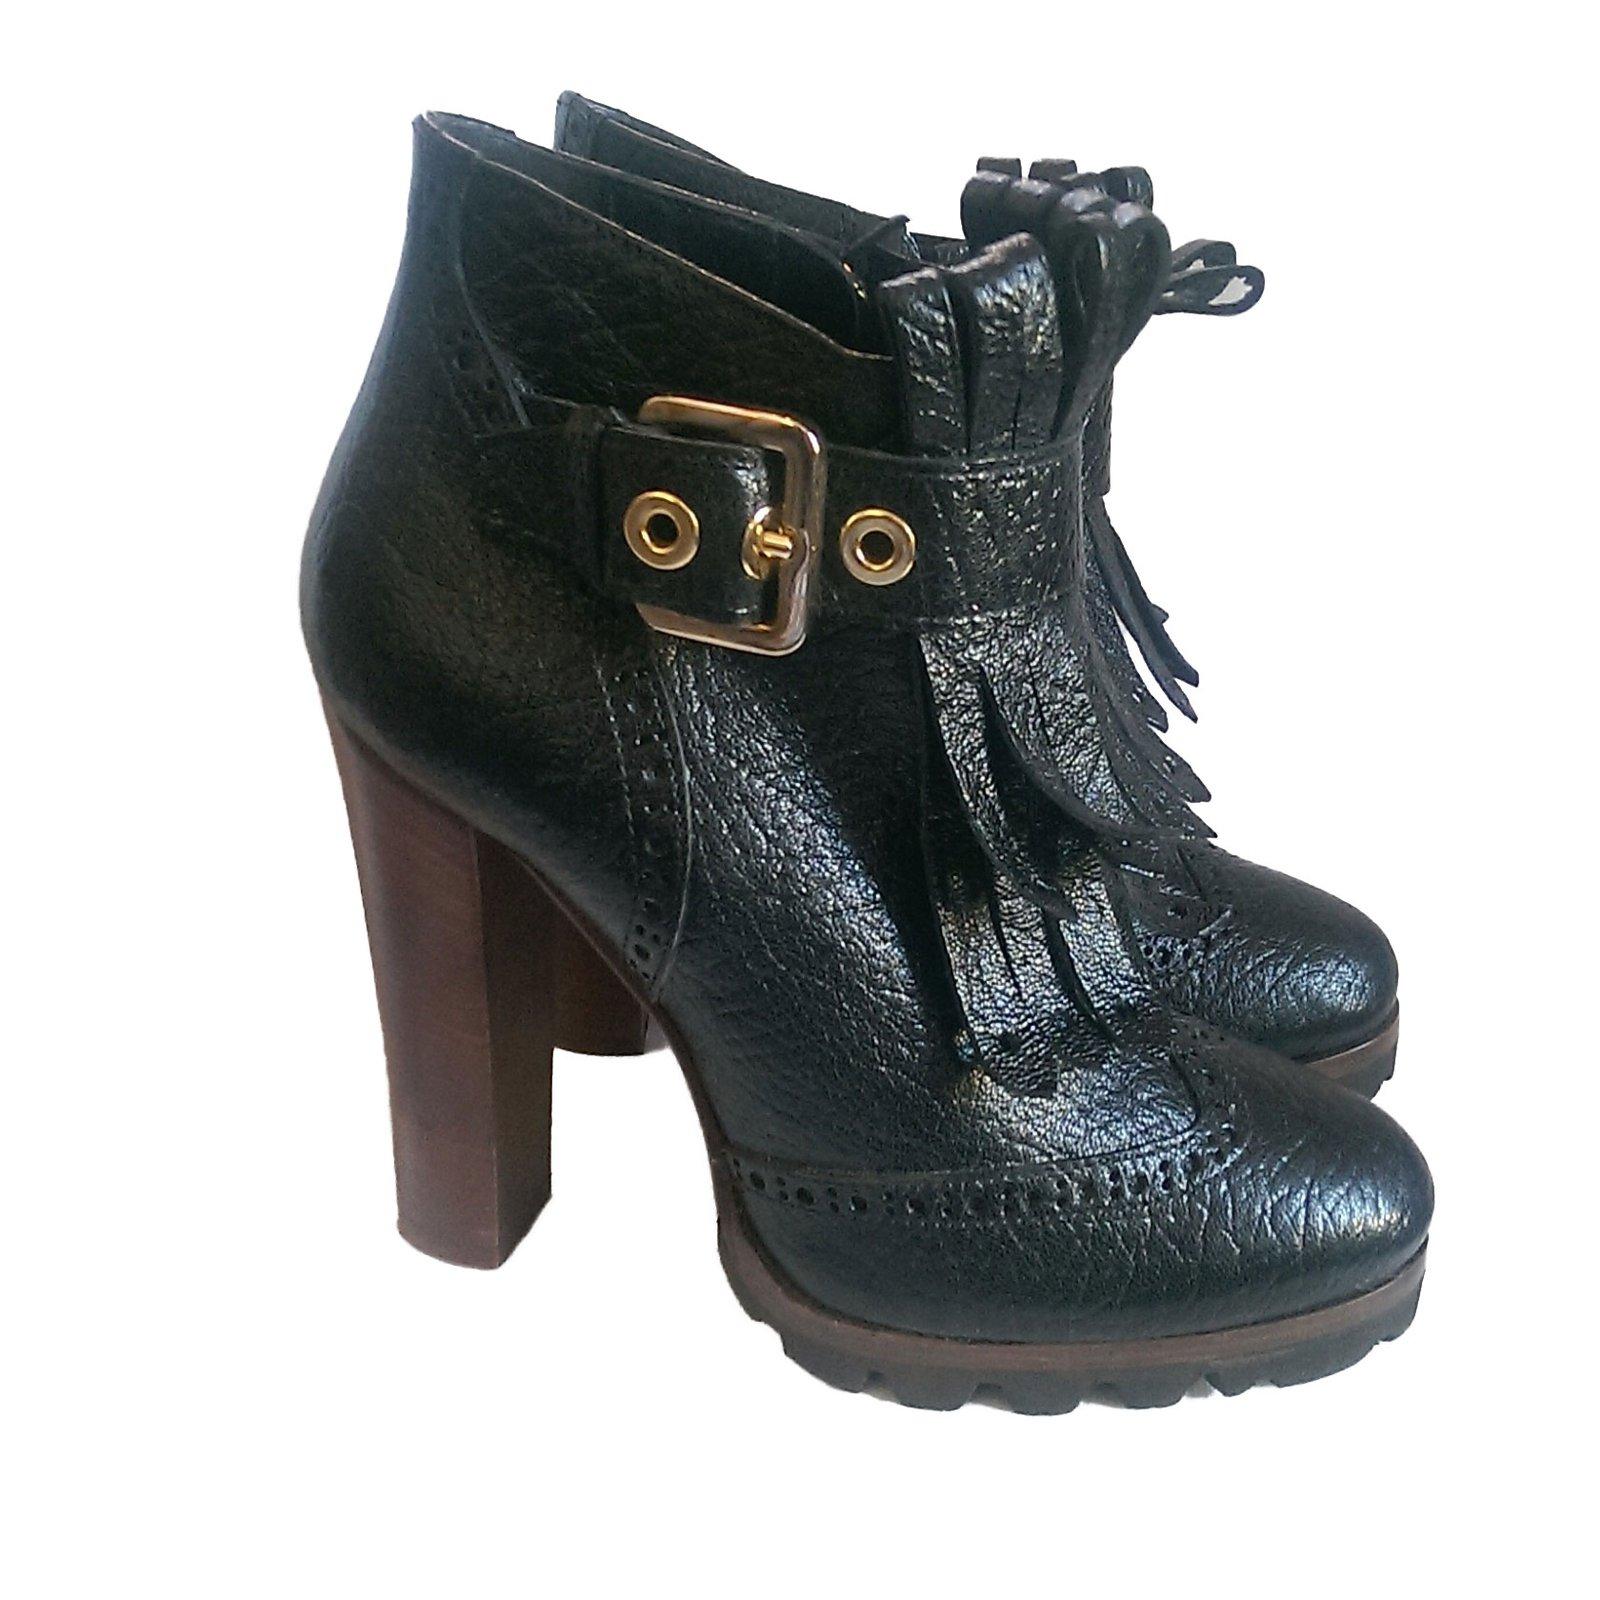 241f3baa5ca3 Autre Marque Aldo Castagna Ankle Boots Leather Black ref.49907 ...